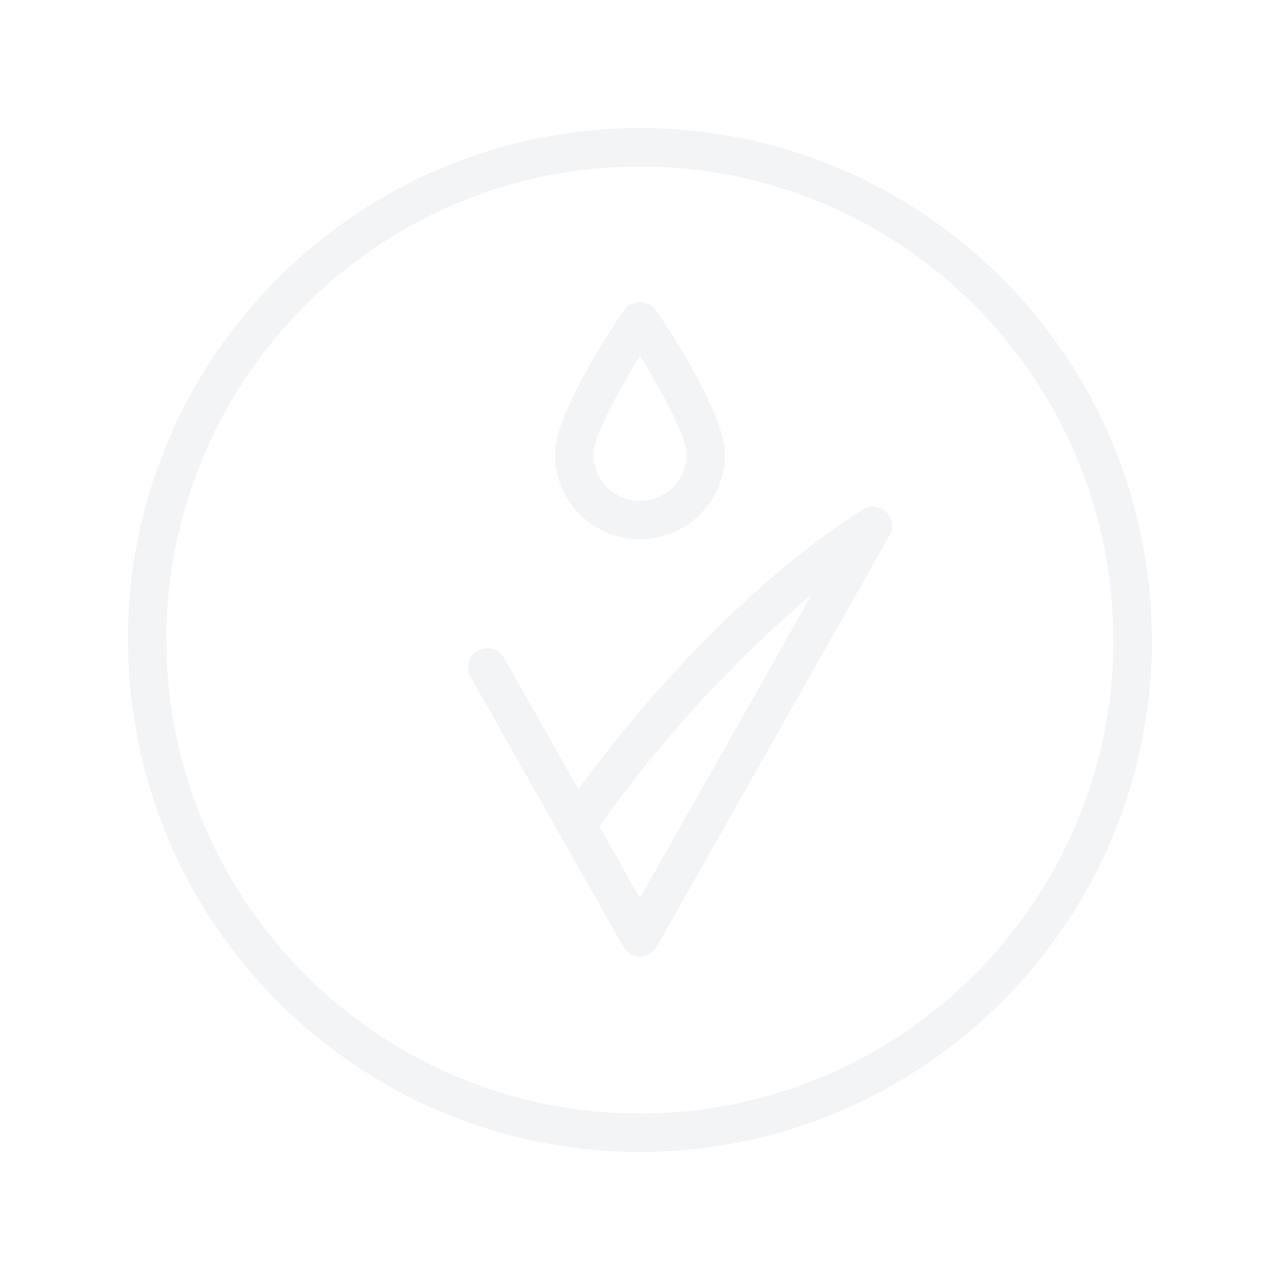 TAHE Organic Care Radiance Leave-In Conditioner (Fine/Dry Hair) несмываемый кондиционер  100ml